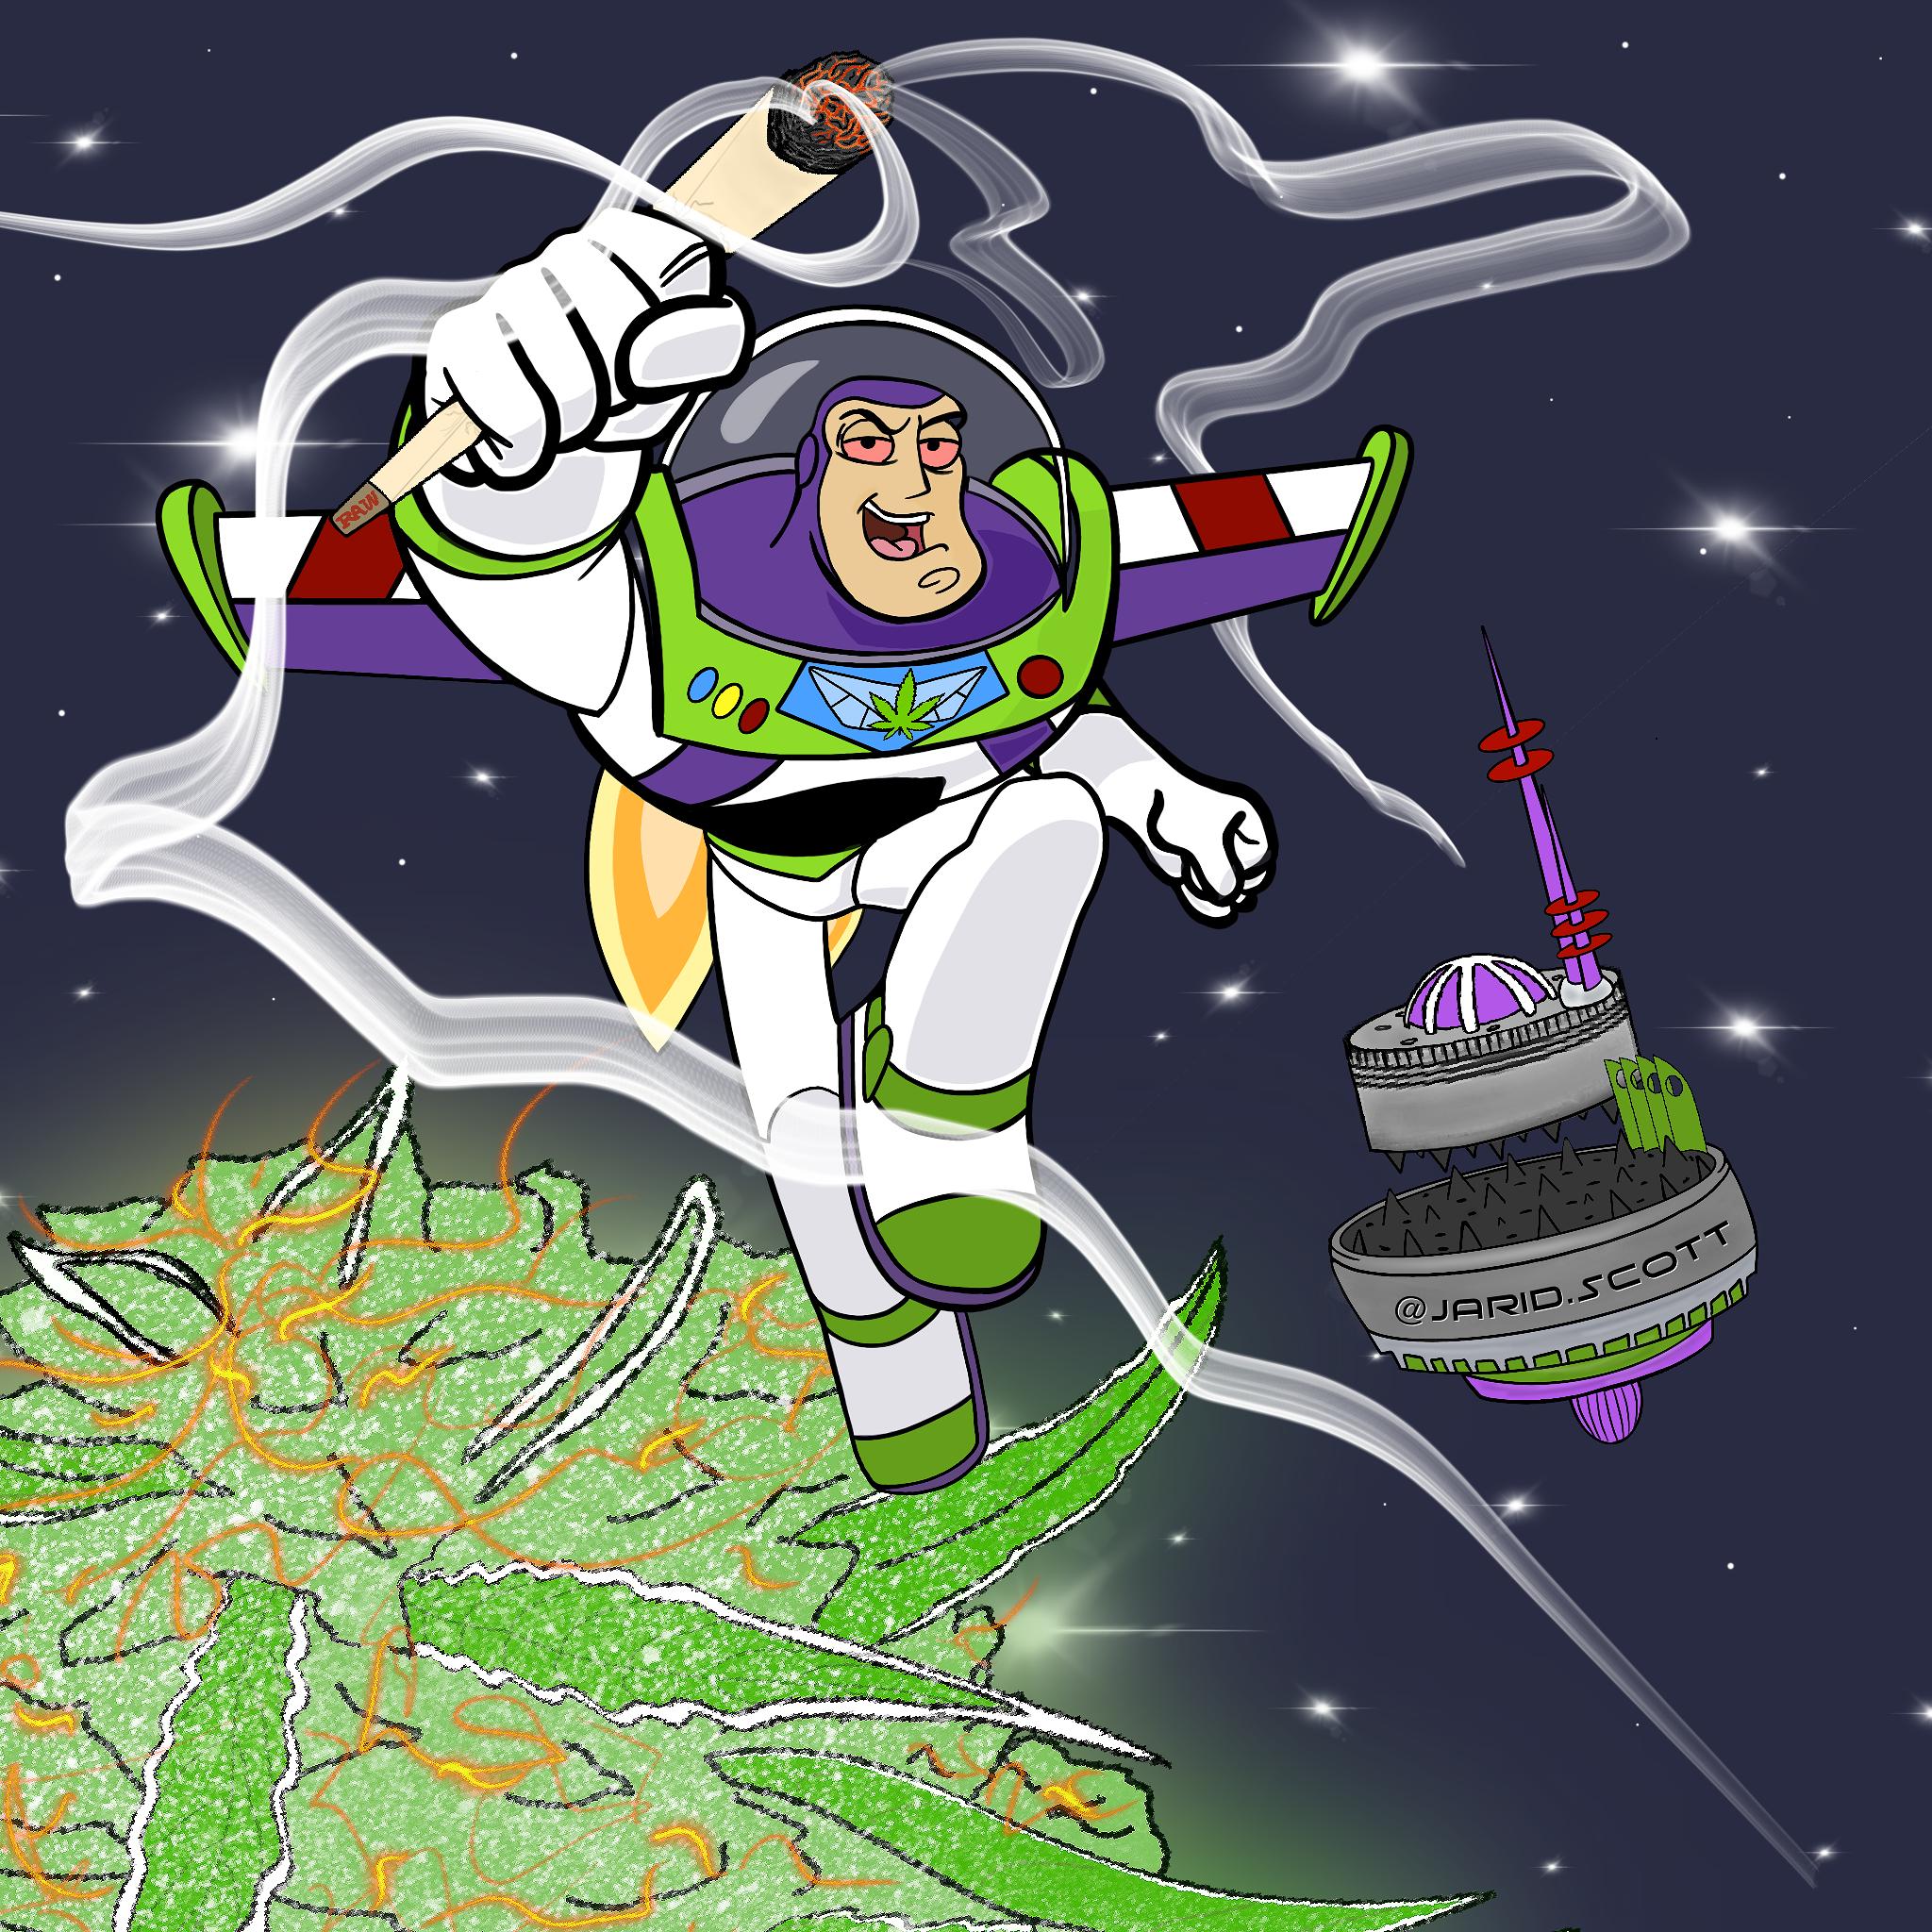 Your Favorite Cartoons Smoking Weed By Jarid Scott